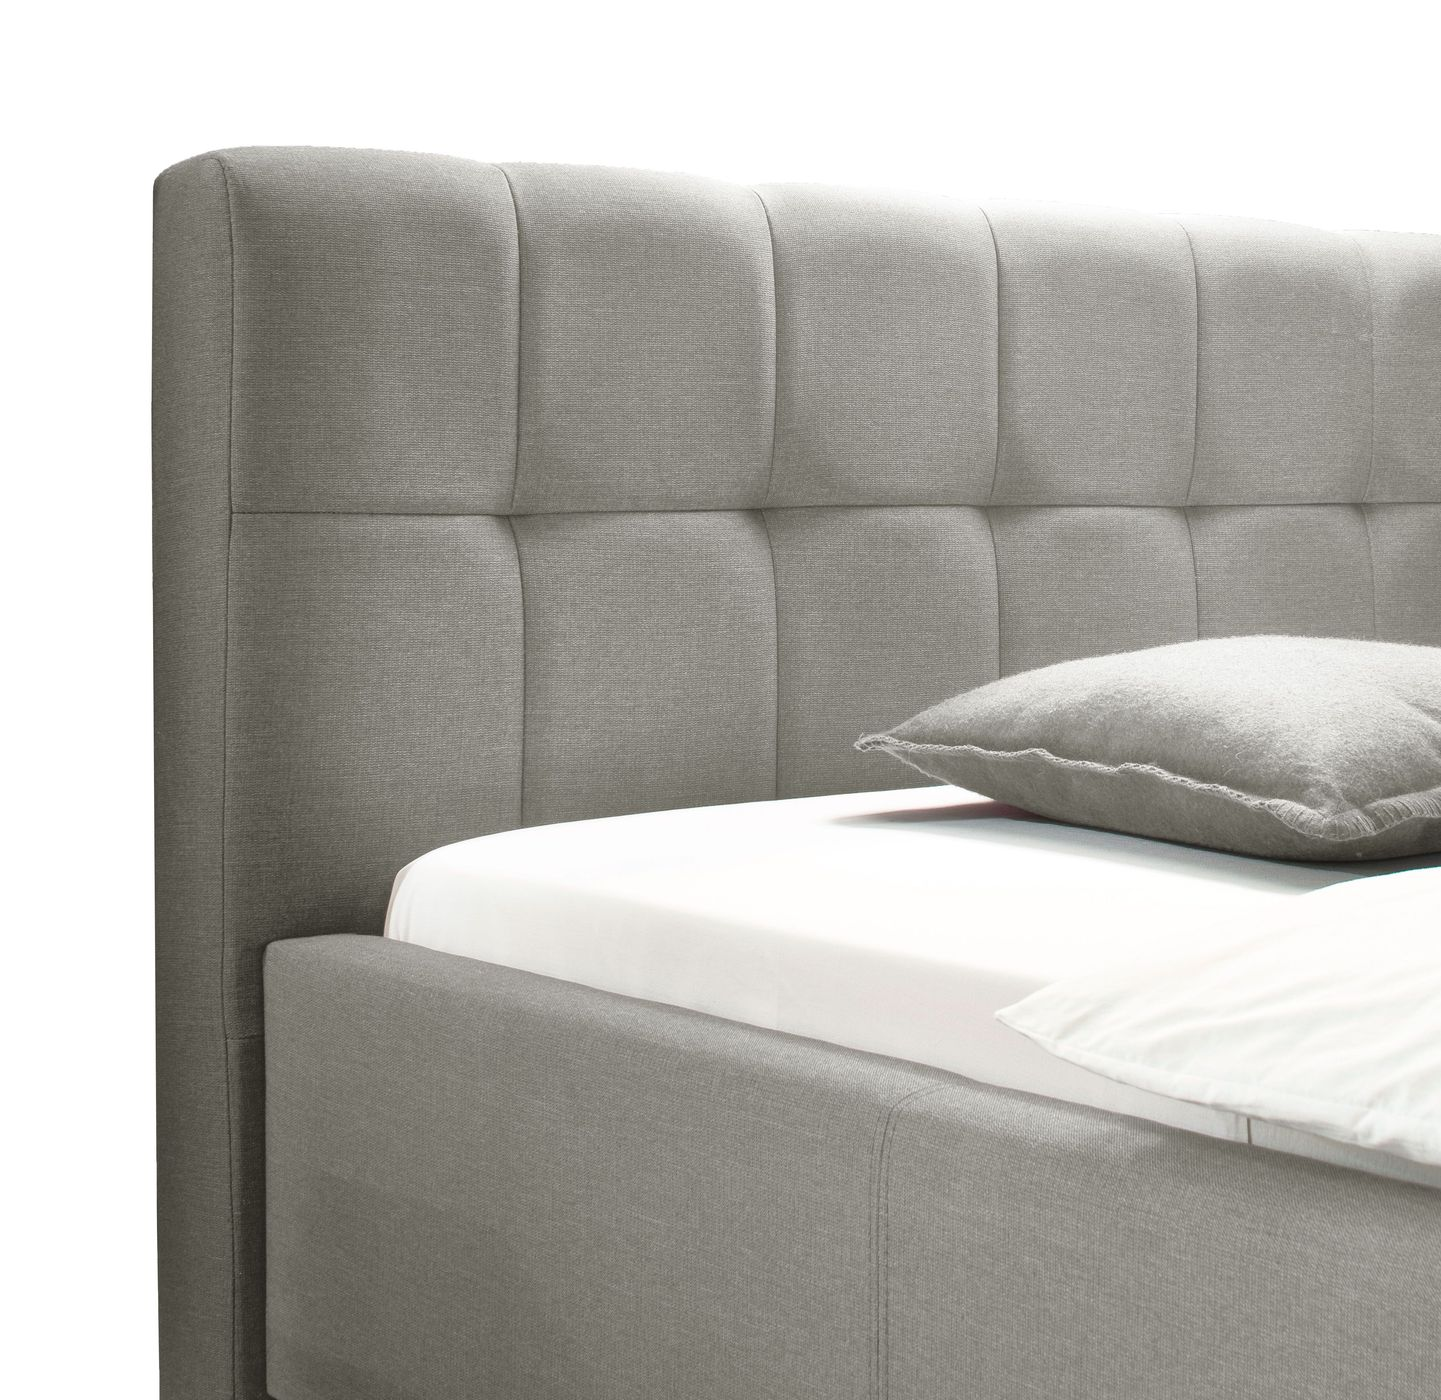 polsterbett in grau f r extra hohe boxspringmatratzen niebla. Black Bedroom Furniture Sets. Home Design Ideas